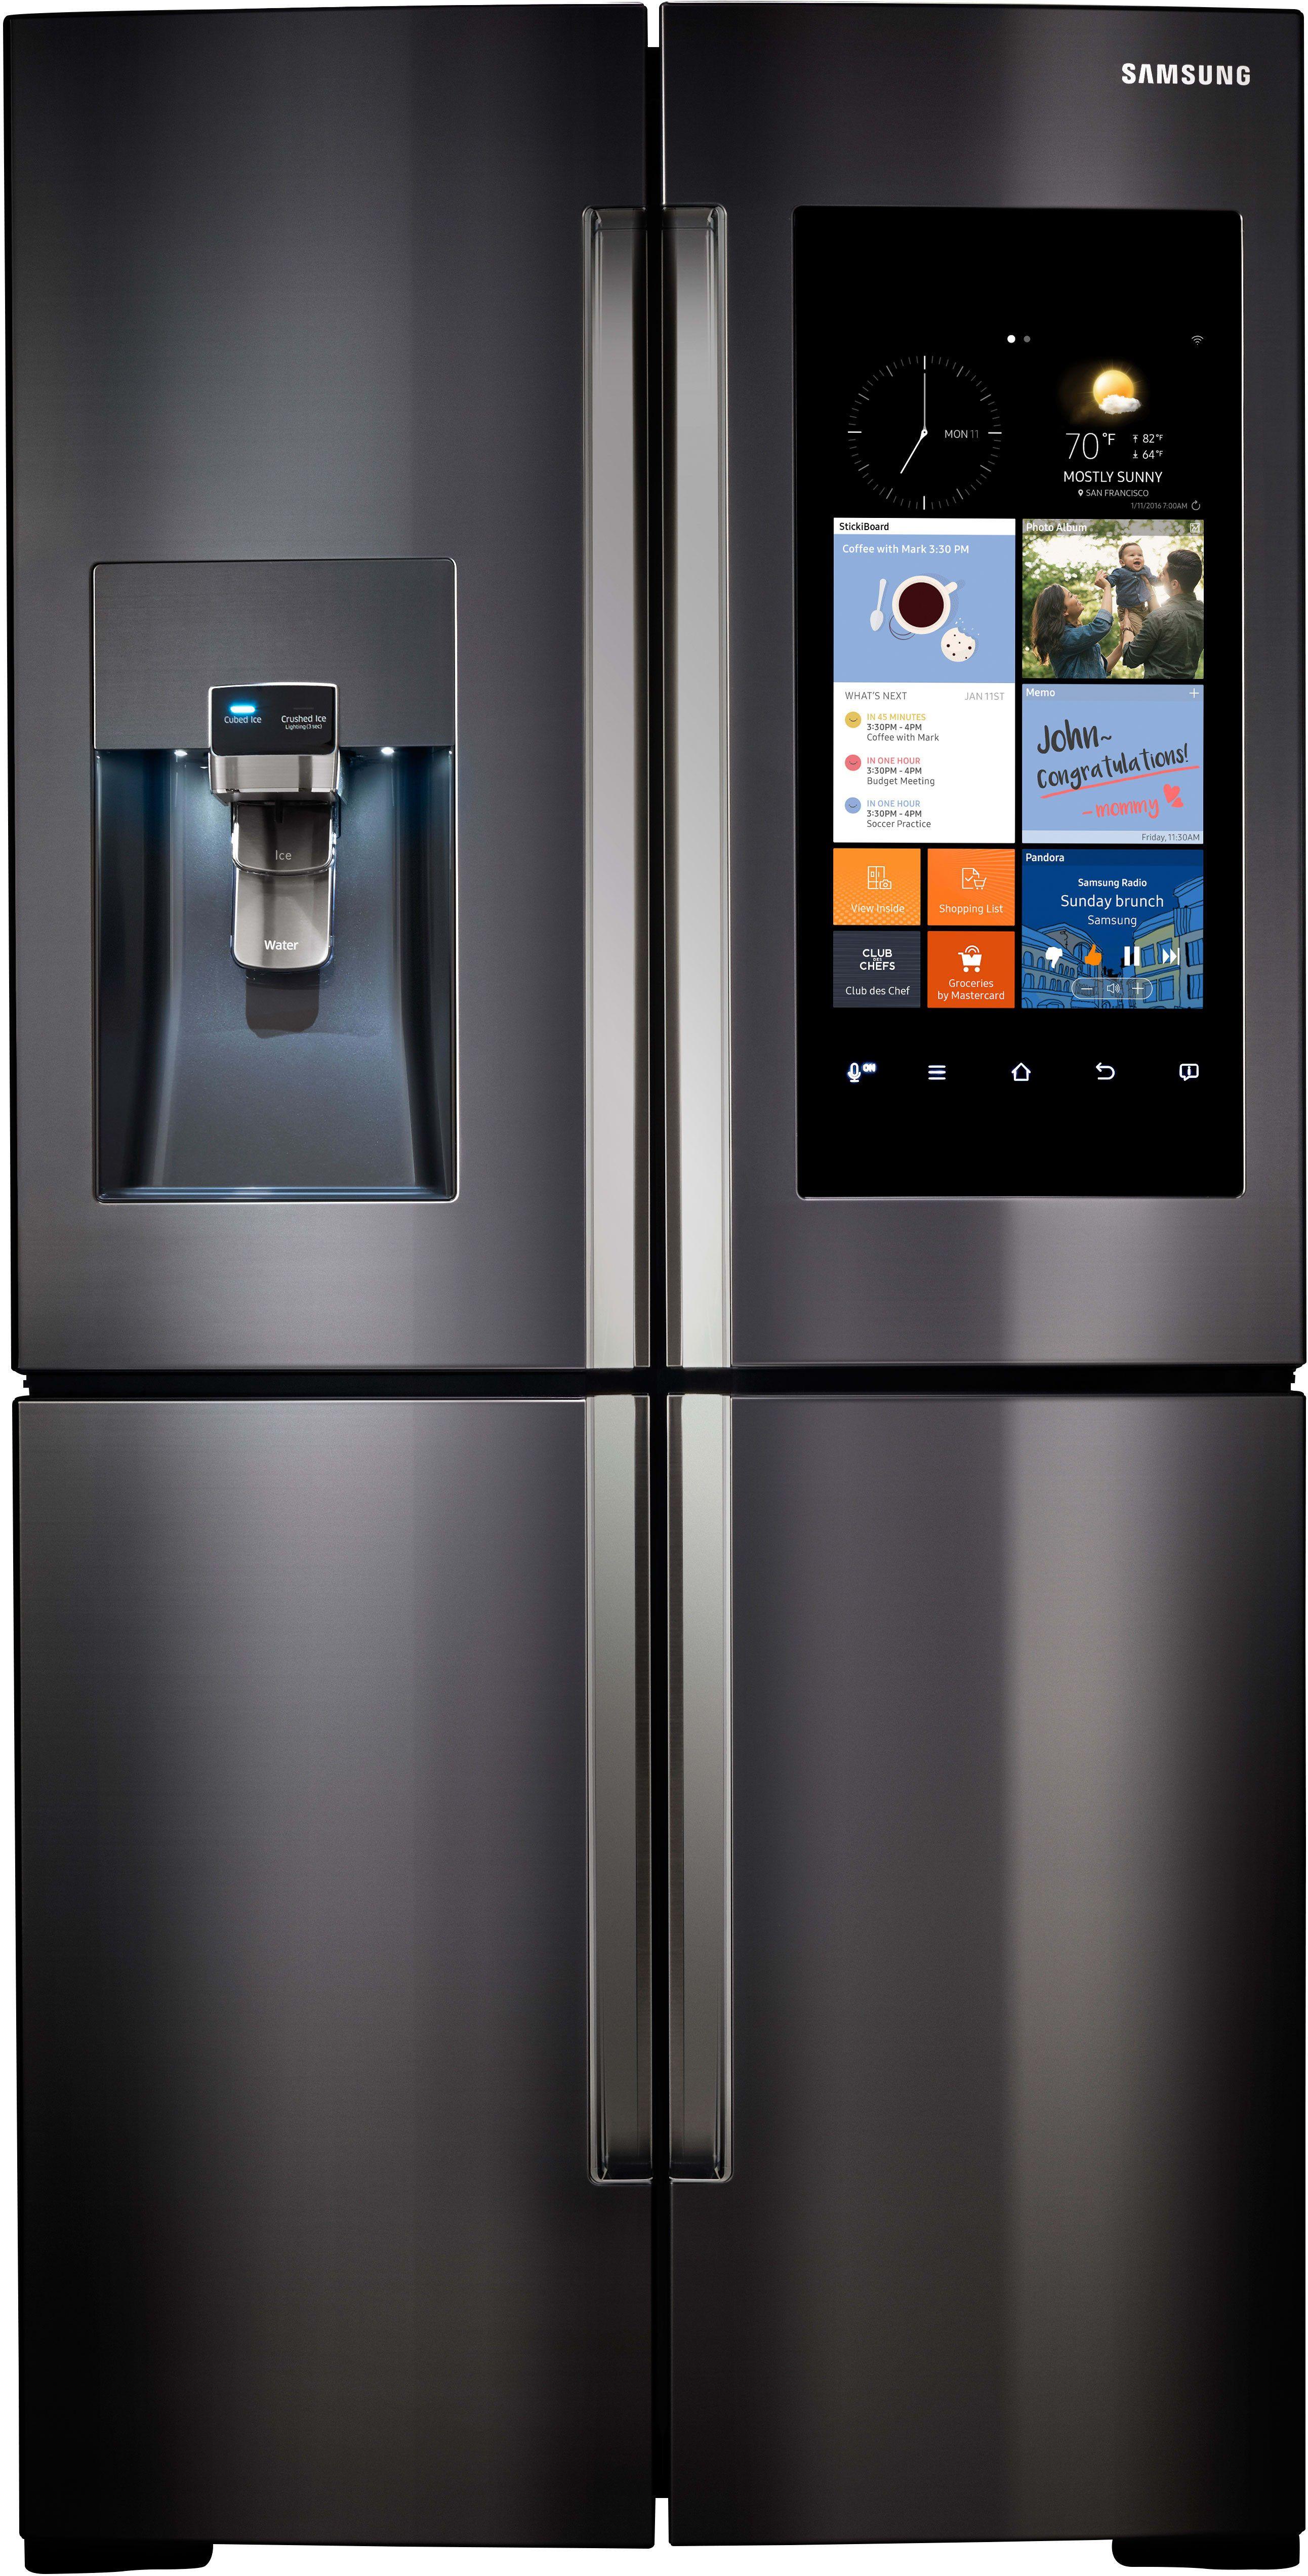 2ee77d7ffe6421f93d81b6ff0f6eb789 - How To Get Ice Master Out Of Samsung Fridge